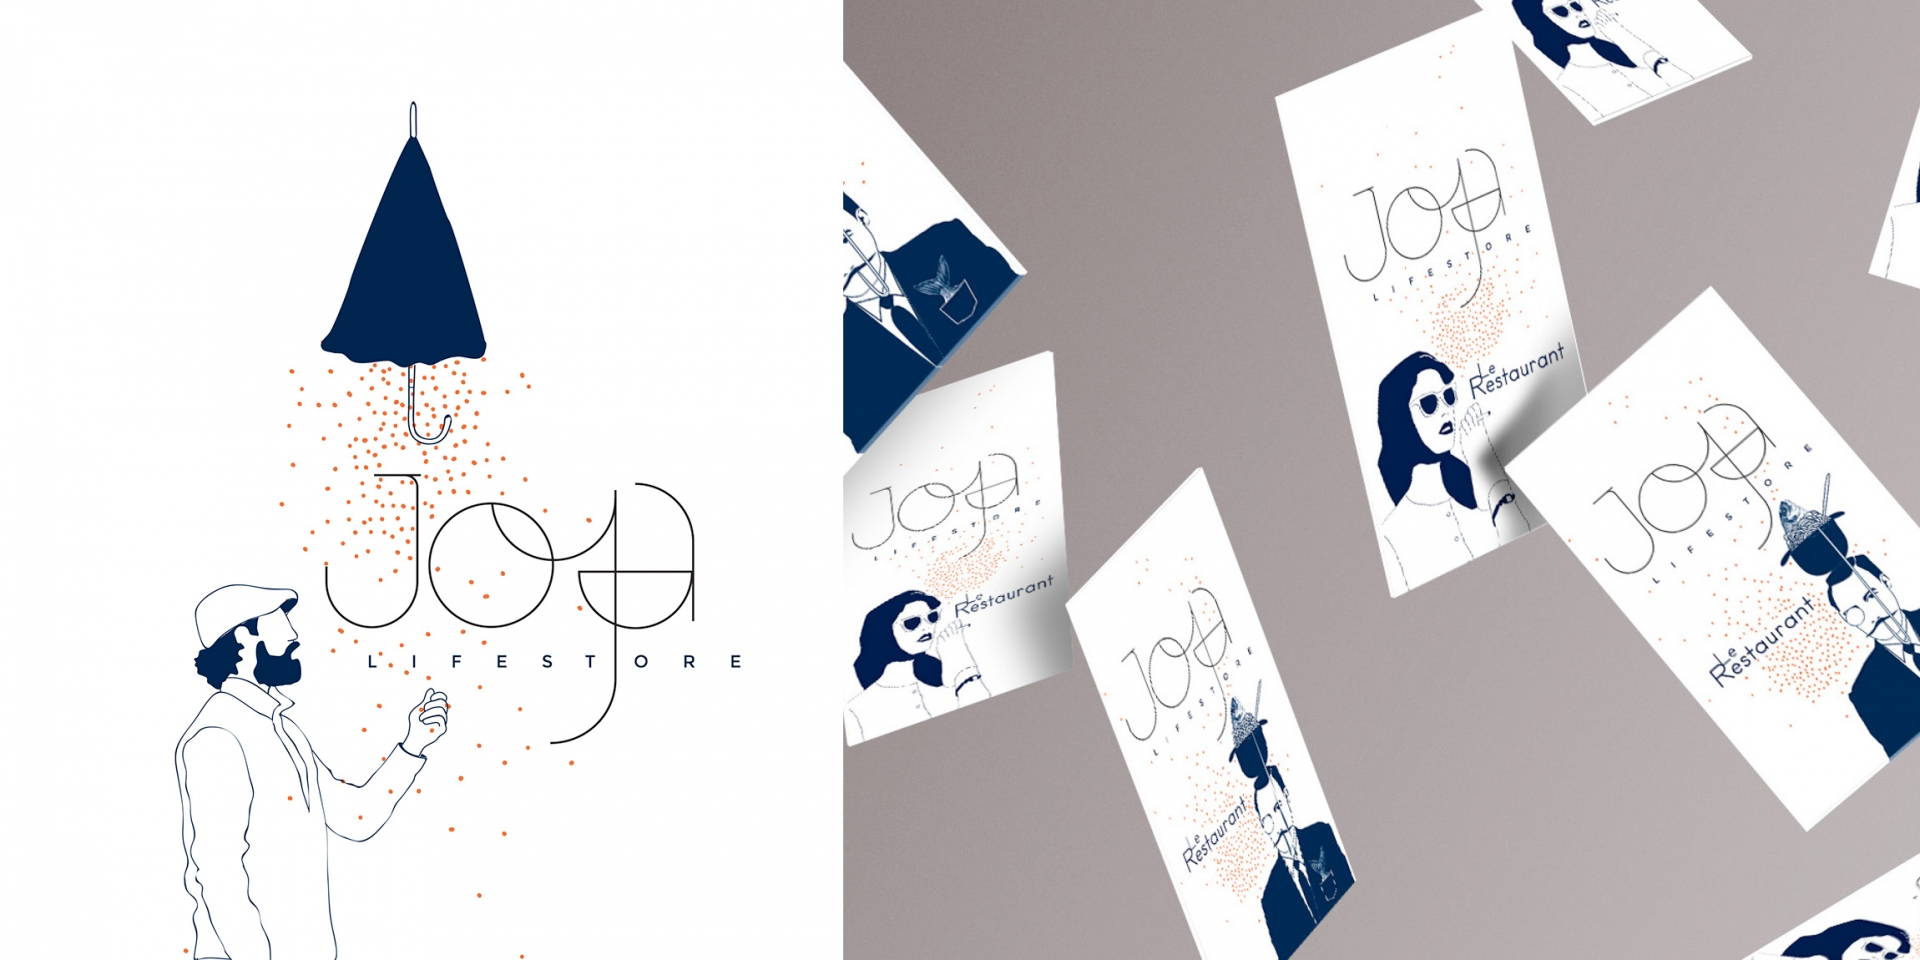 JOYA-Lifestore-1920x960